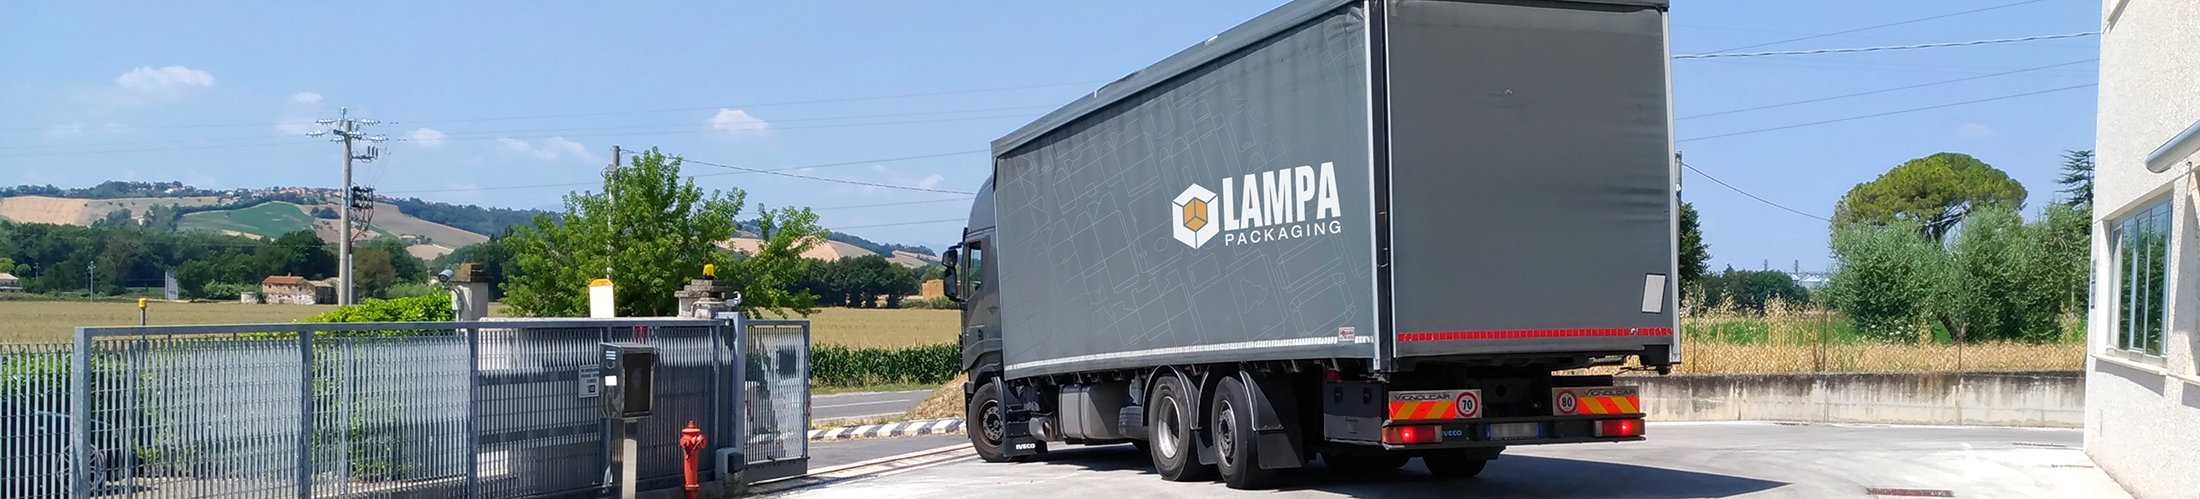 lampa_packaging_logistica_2200x500